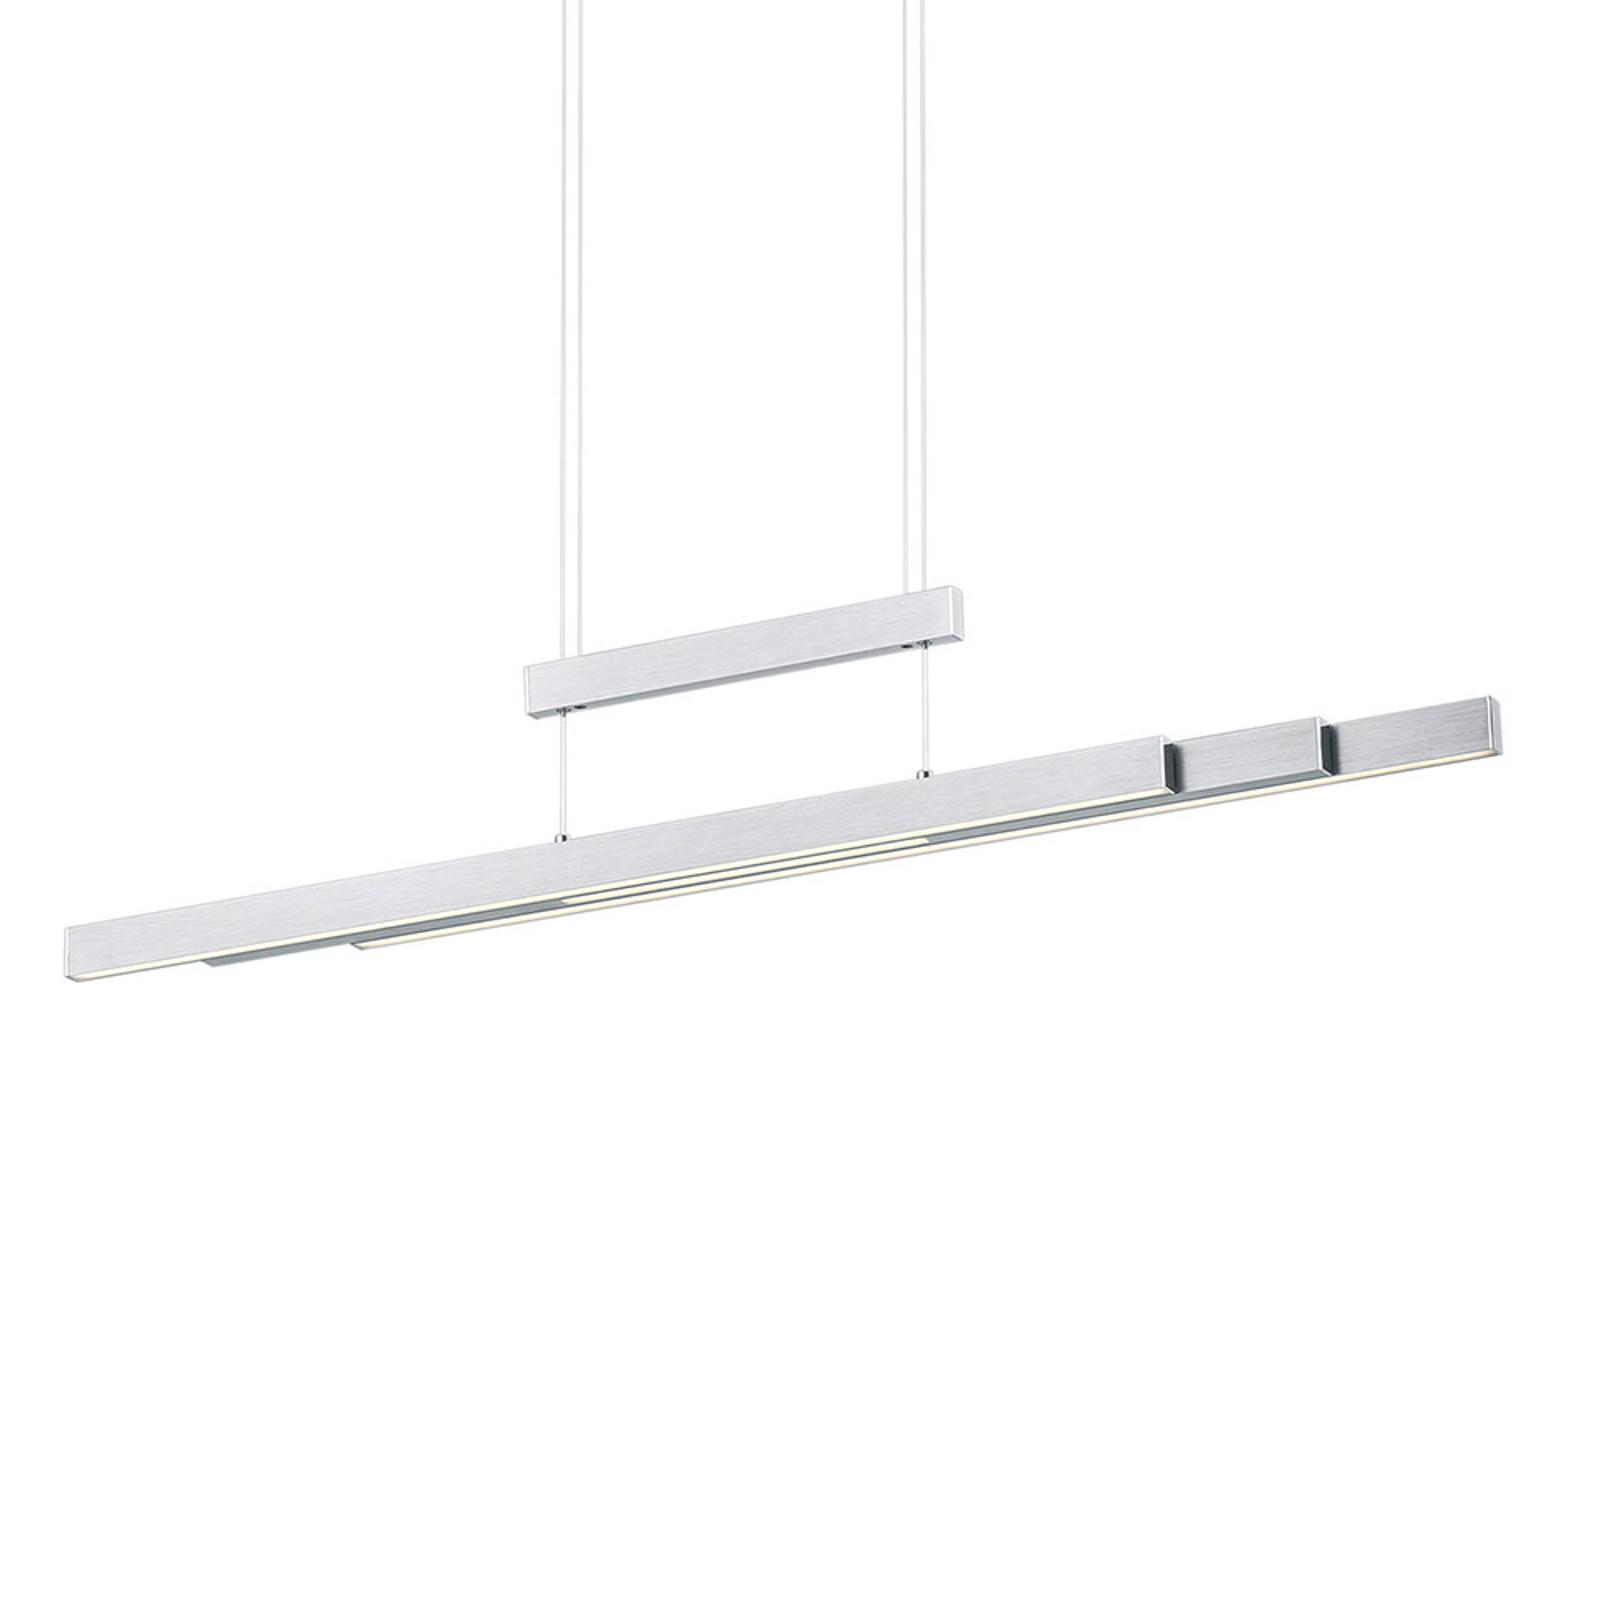 Suspension LED Trajan, 2700 - 5000K, nickel mat